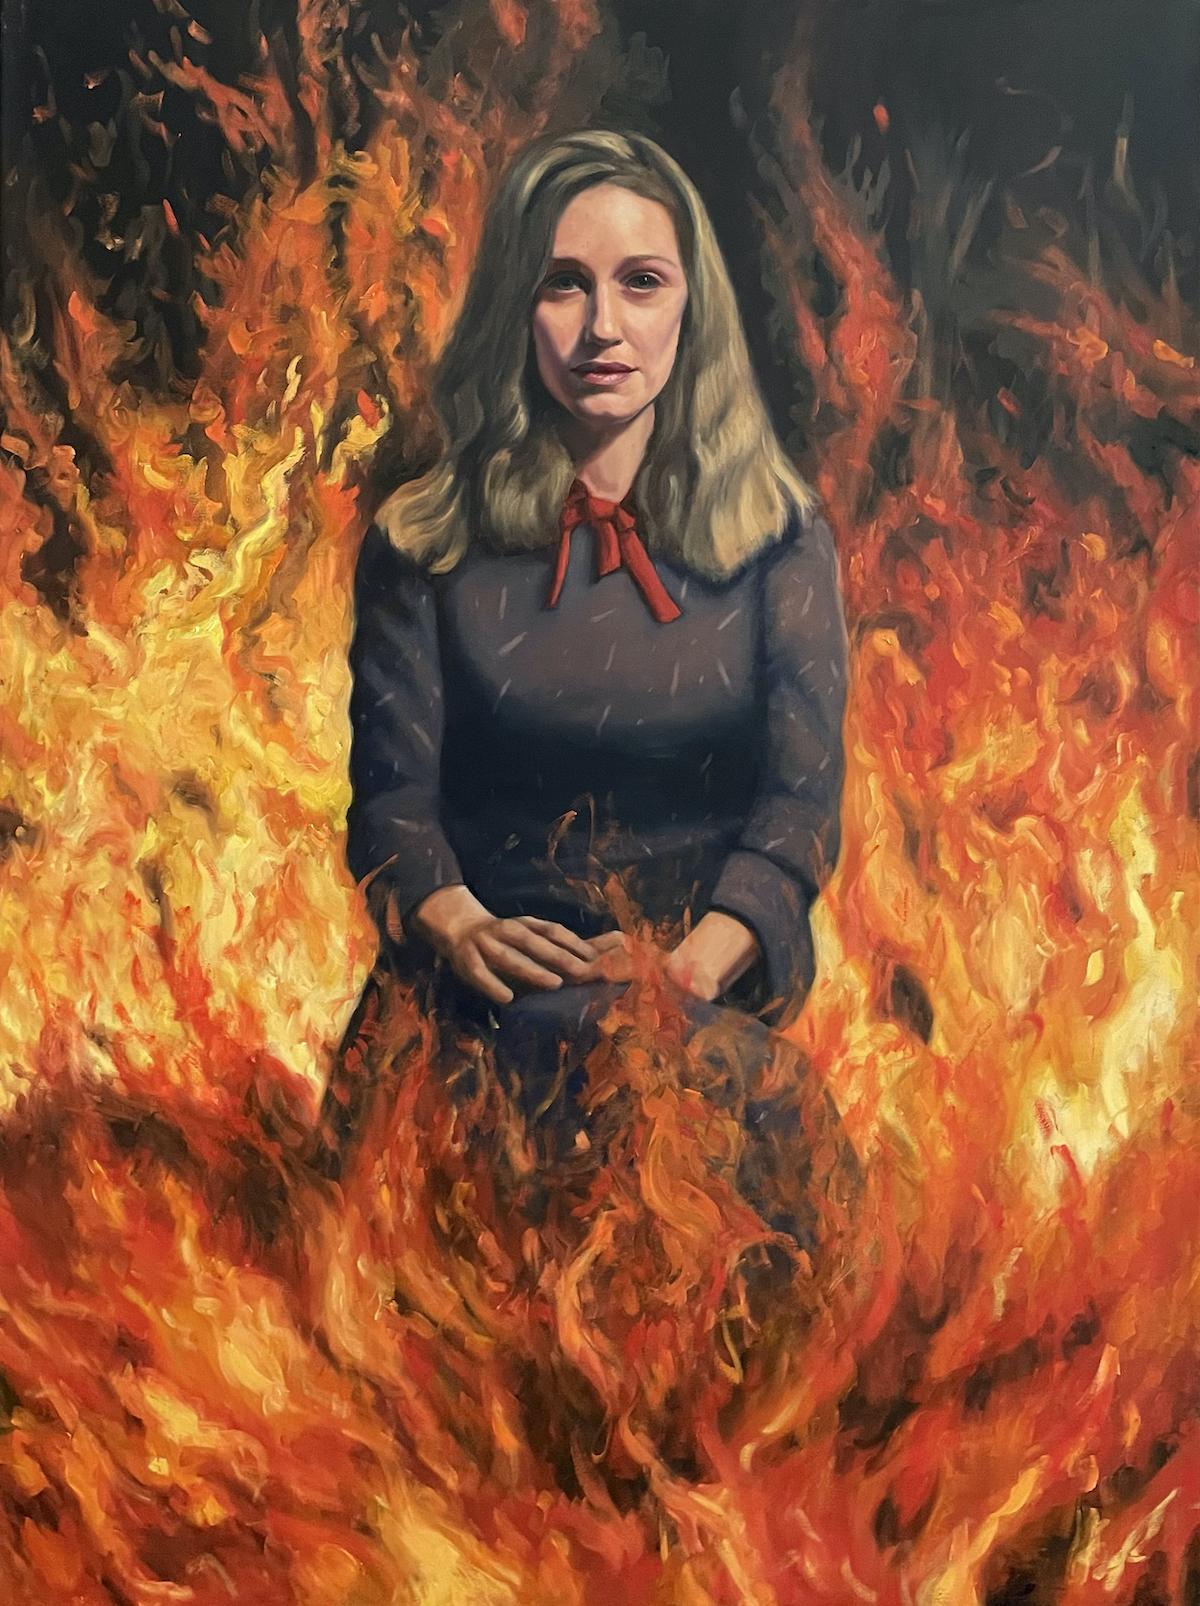 Racheli in flames